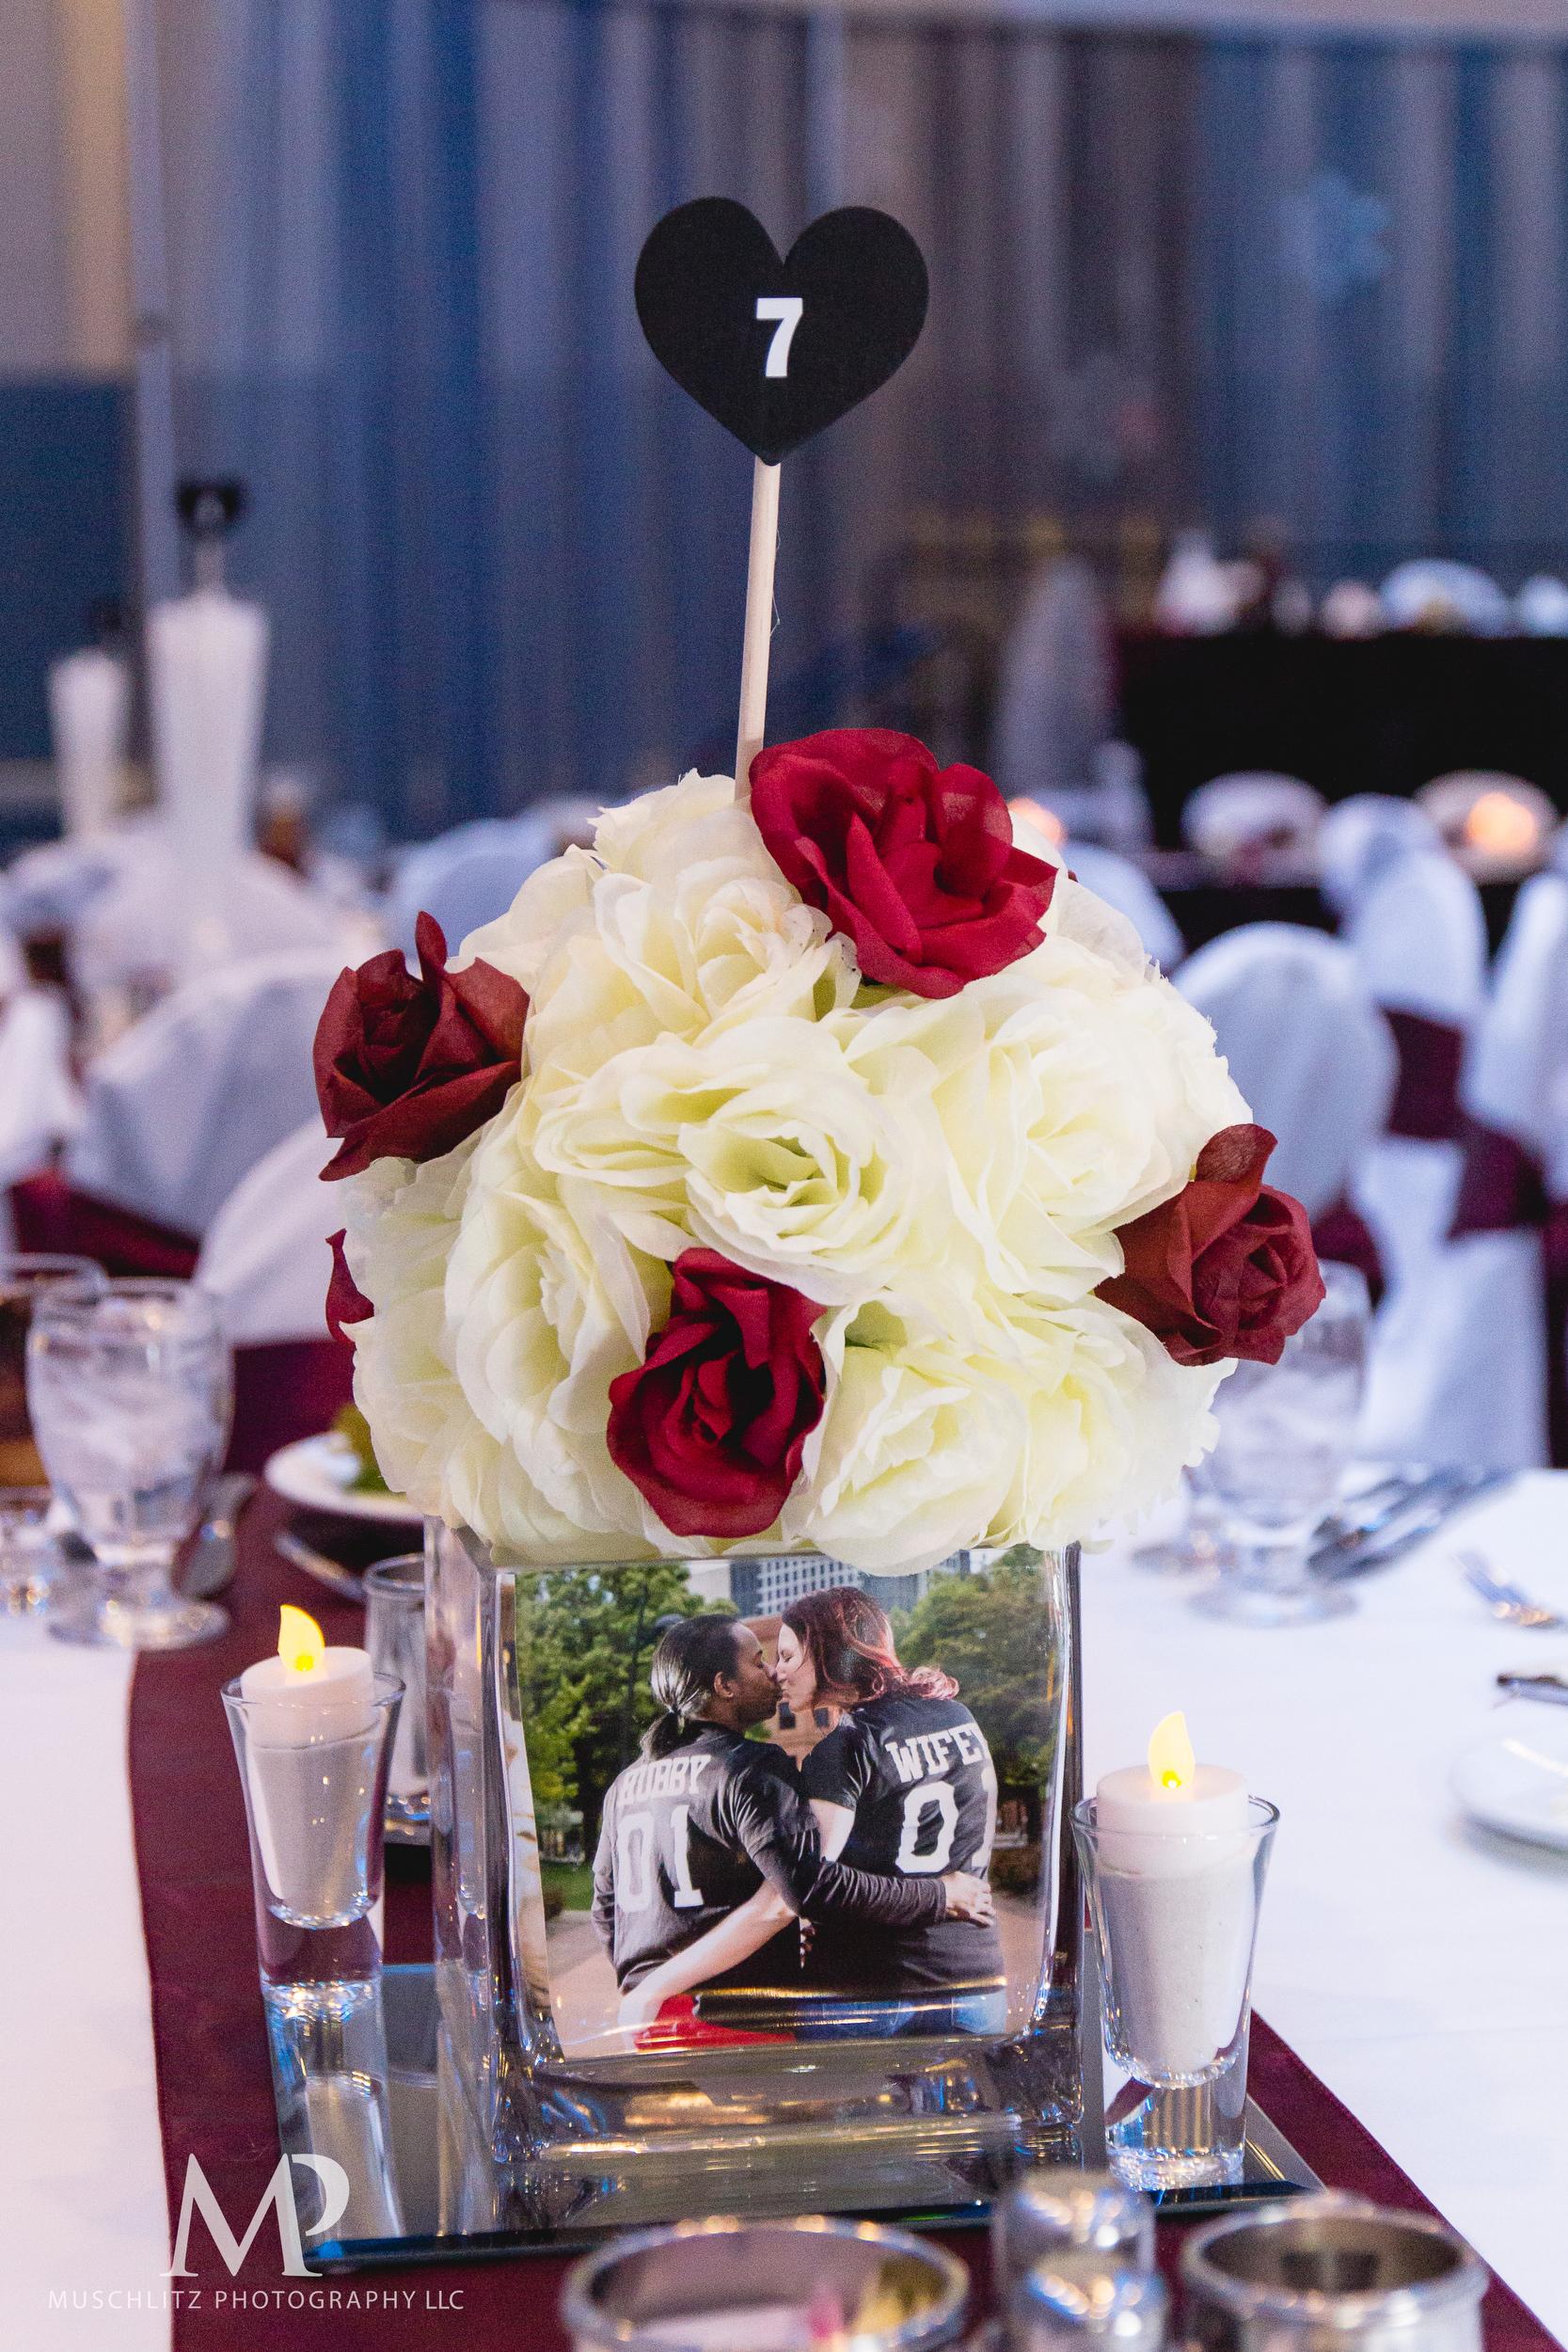 greater-columbus-convention-center-winter-wedding-ceremony-reception-portraits-columbus-ohio-muschlitz-photography-065.JPG